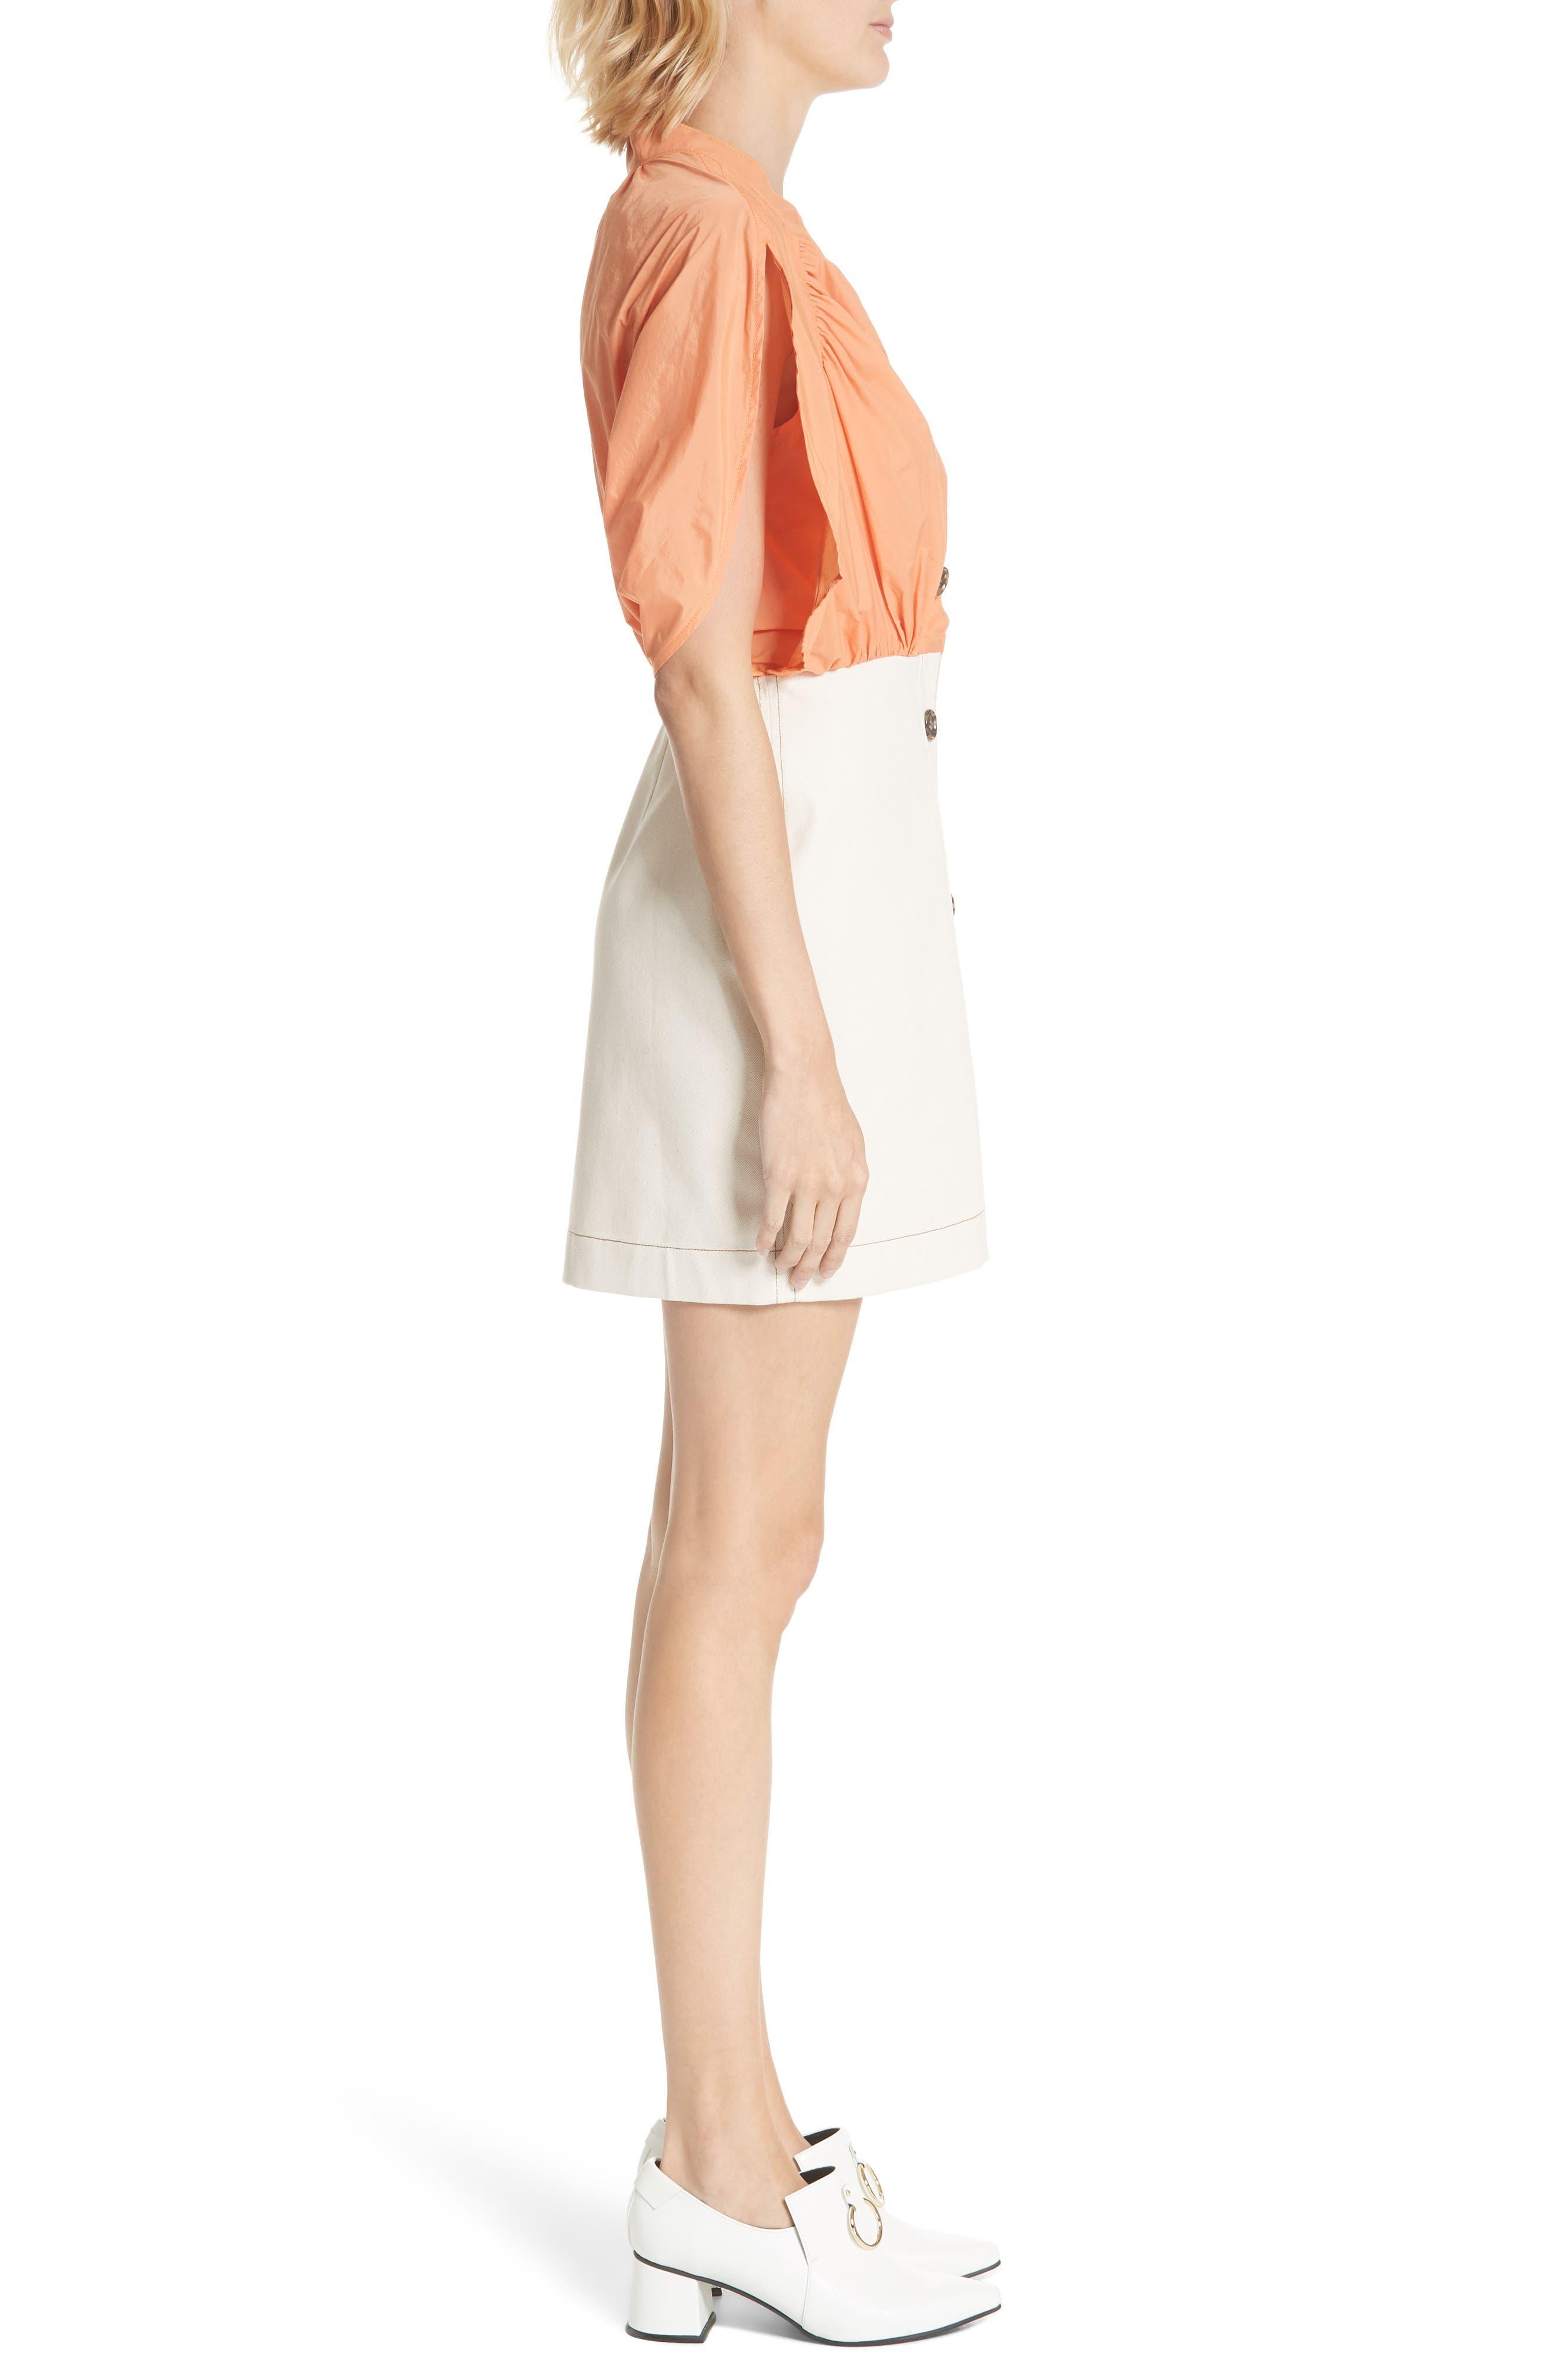 Yana Bicolor Dress,                             Alternate thumbnail 3, color,                             Cotton Orange/ Denim Ecru